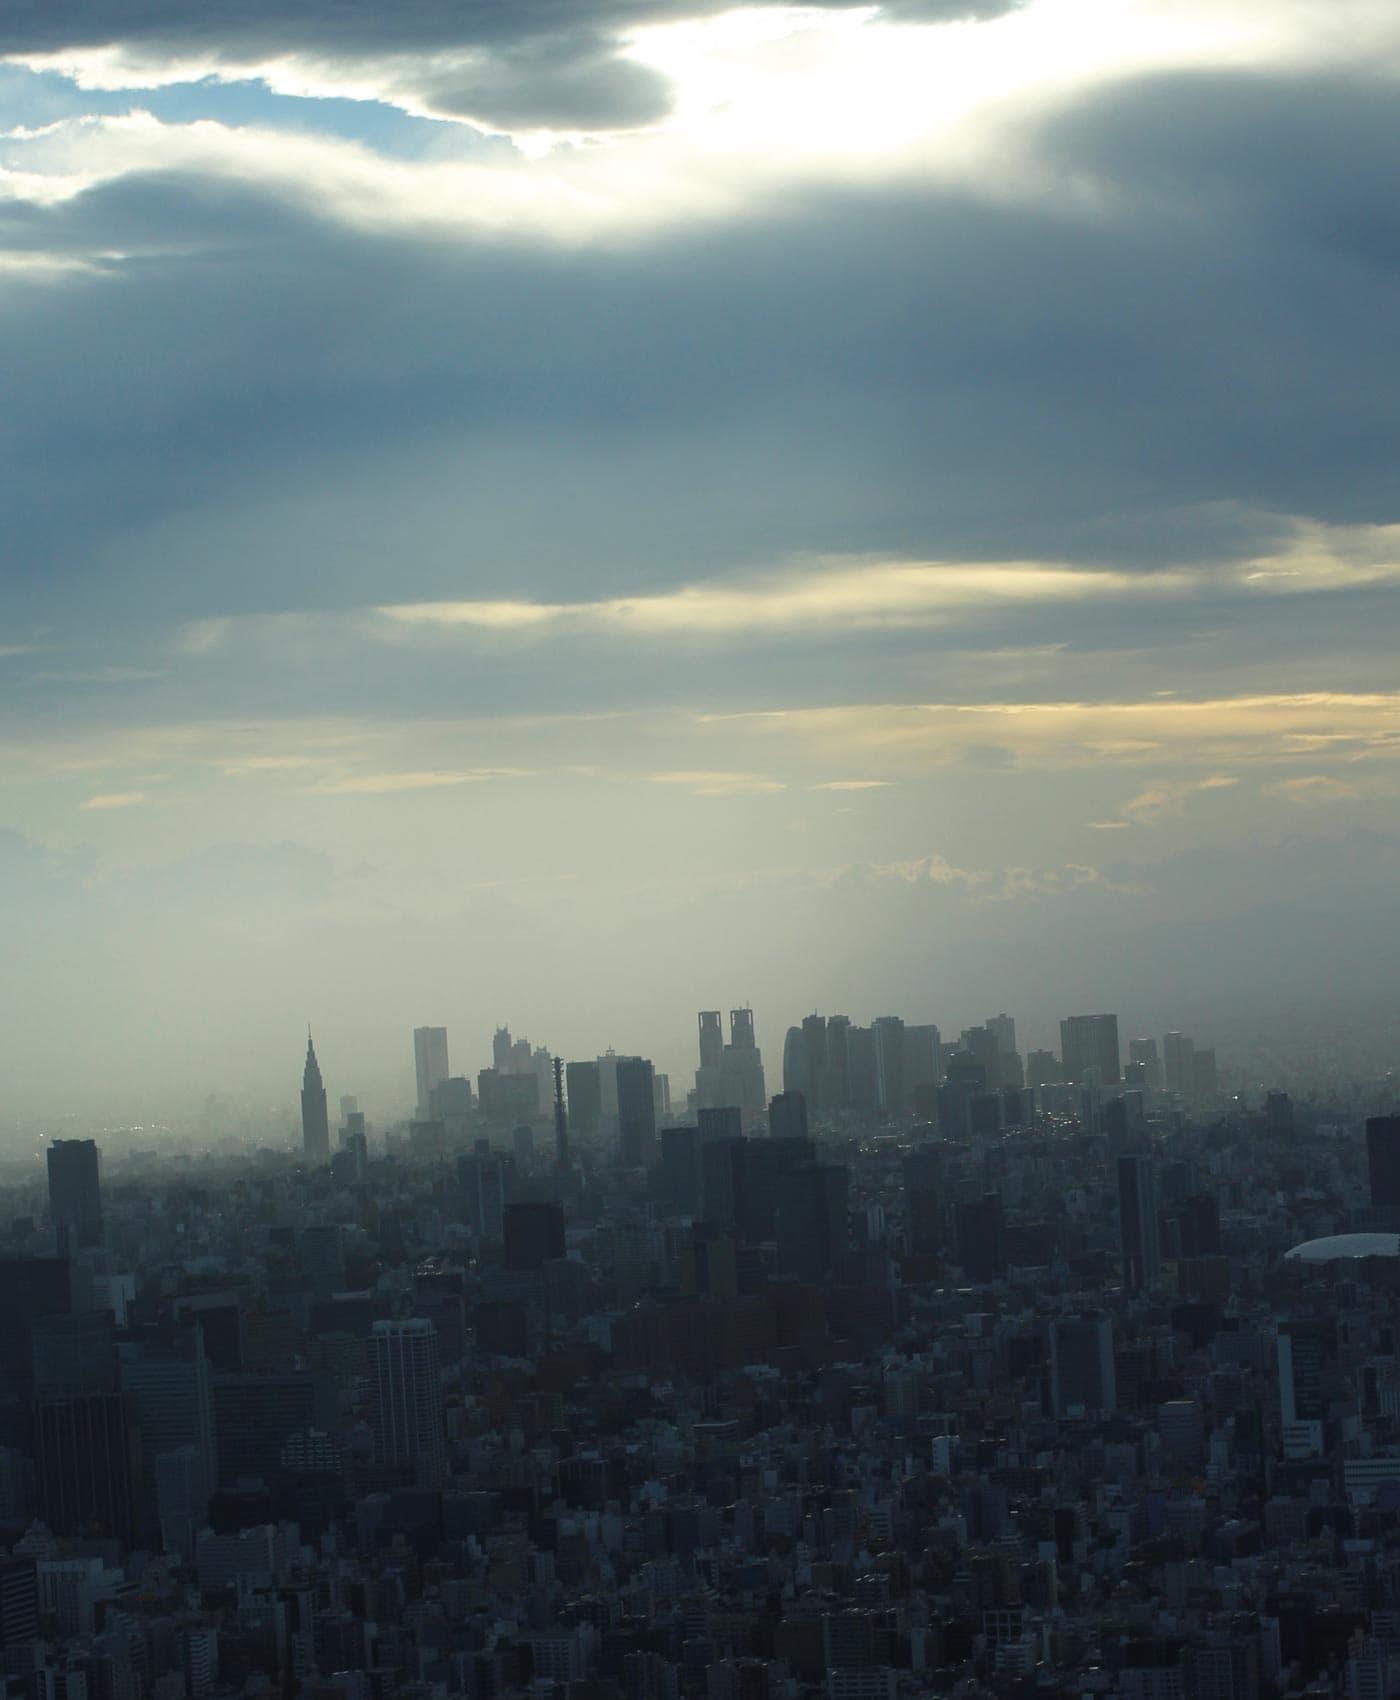 Japanreise mit Baby: Megacity Tokio Skyline // HIMBEER